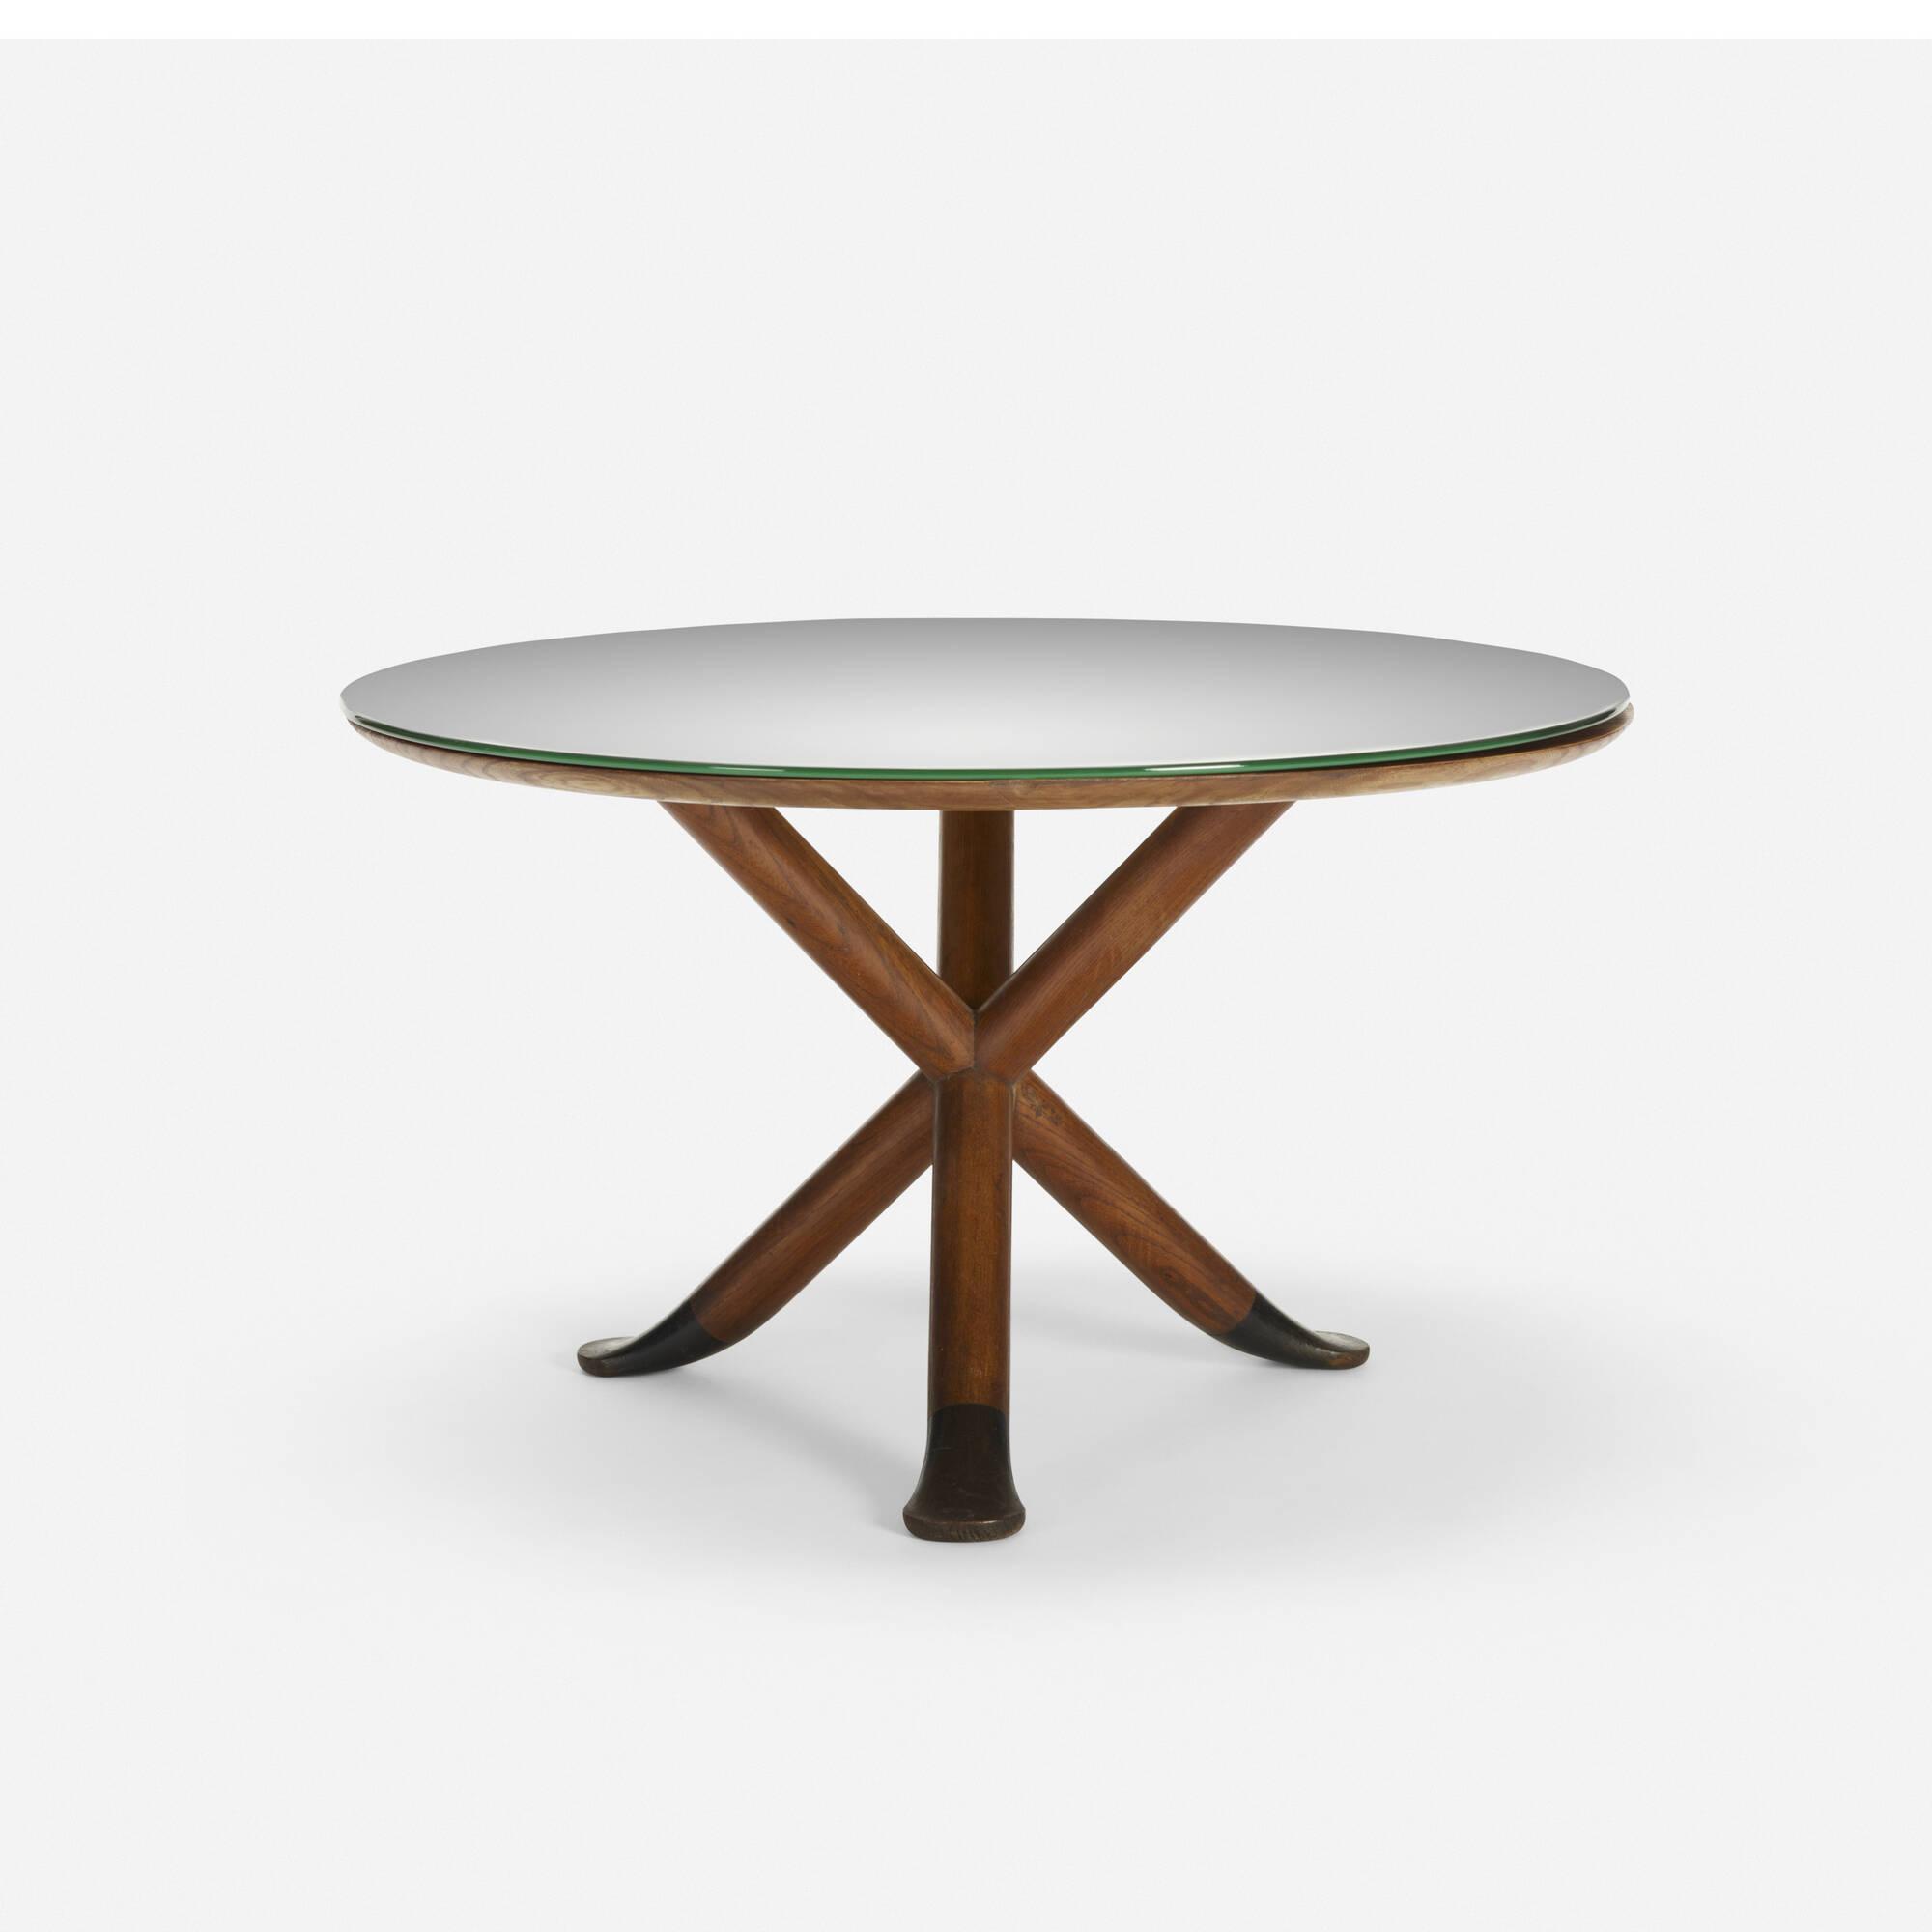 301: Pietro Chiesa / coffee table (1 of 2)